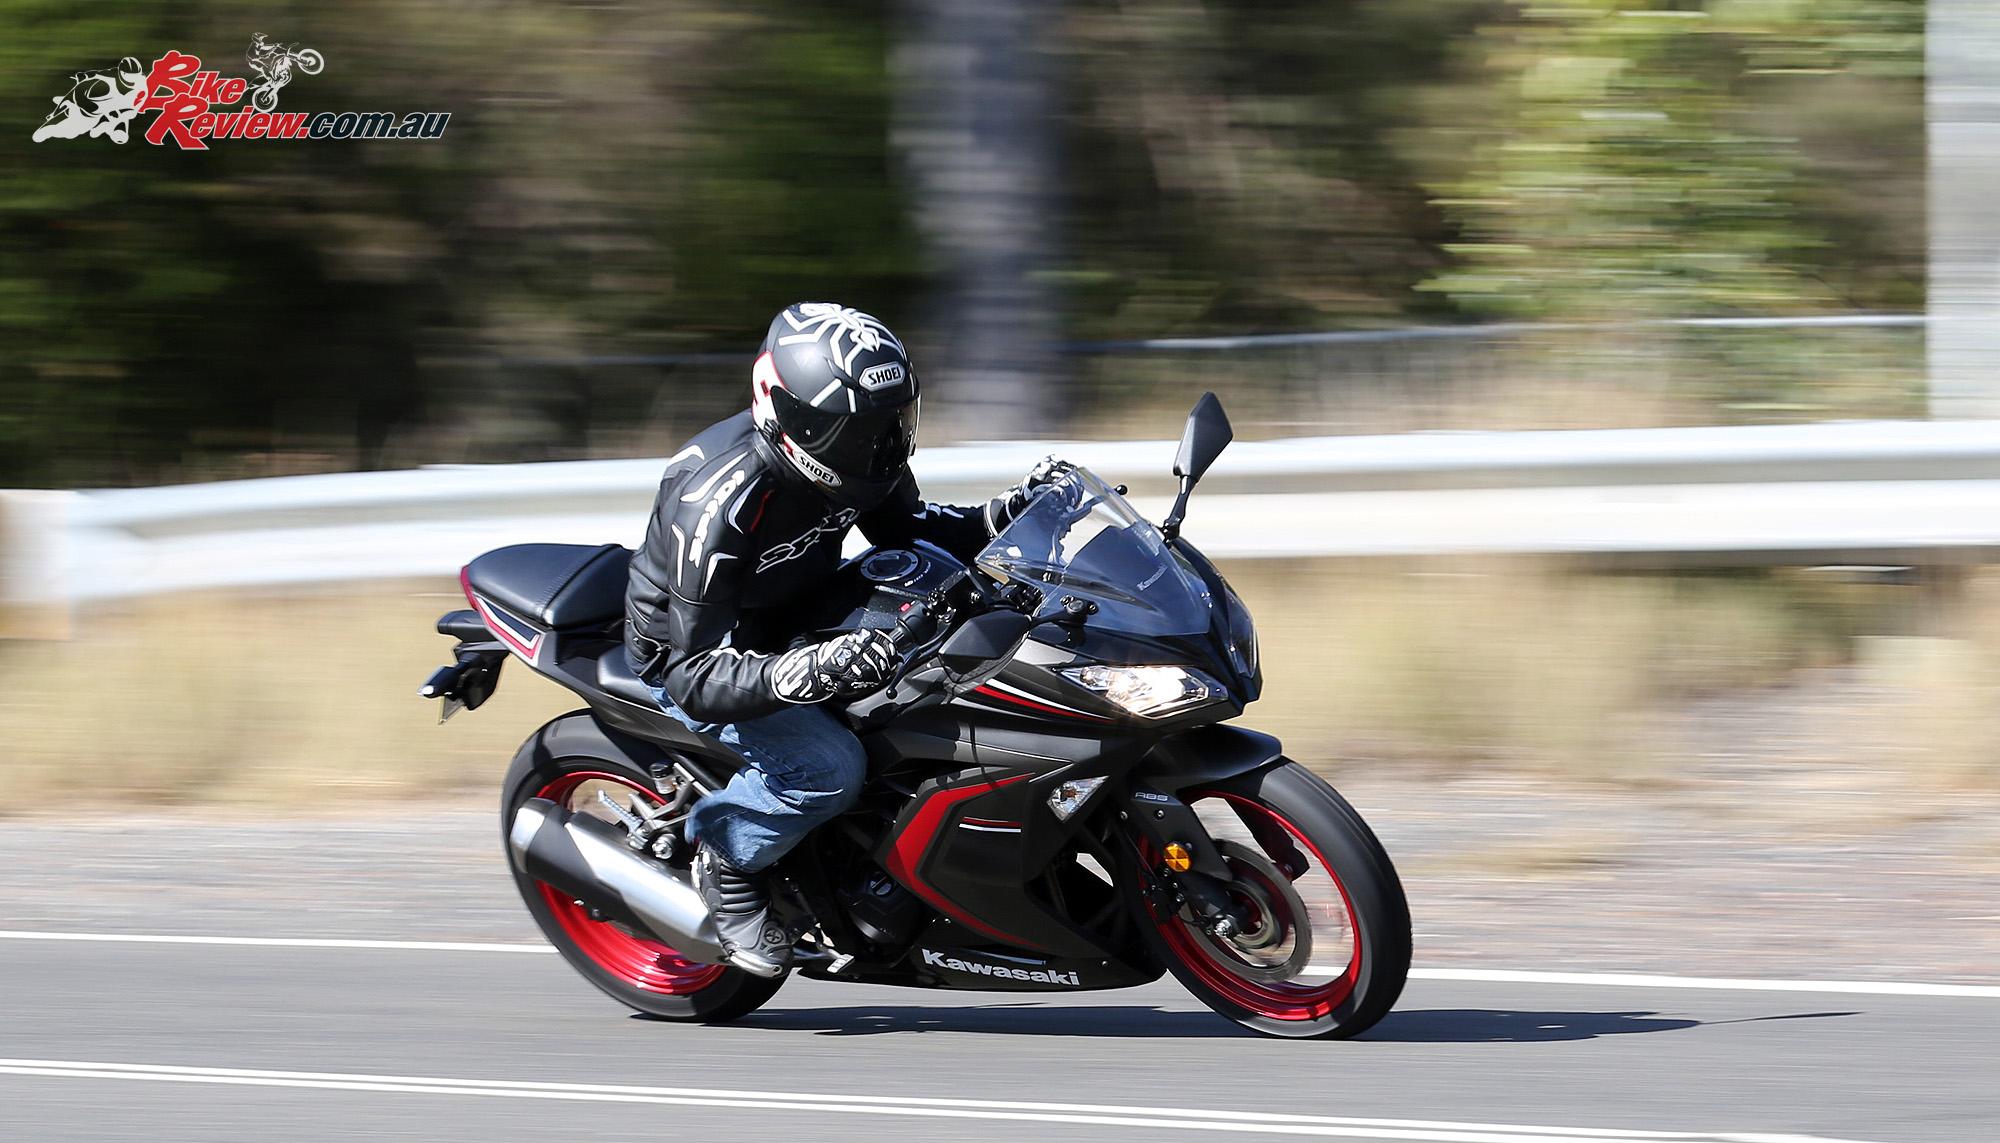 Kawasaki  Ninja Review